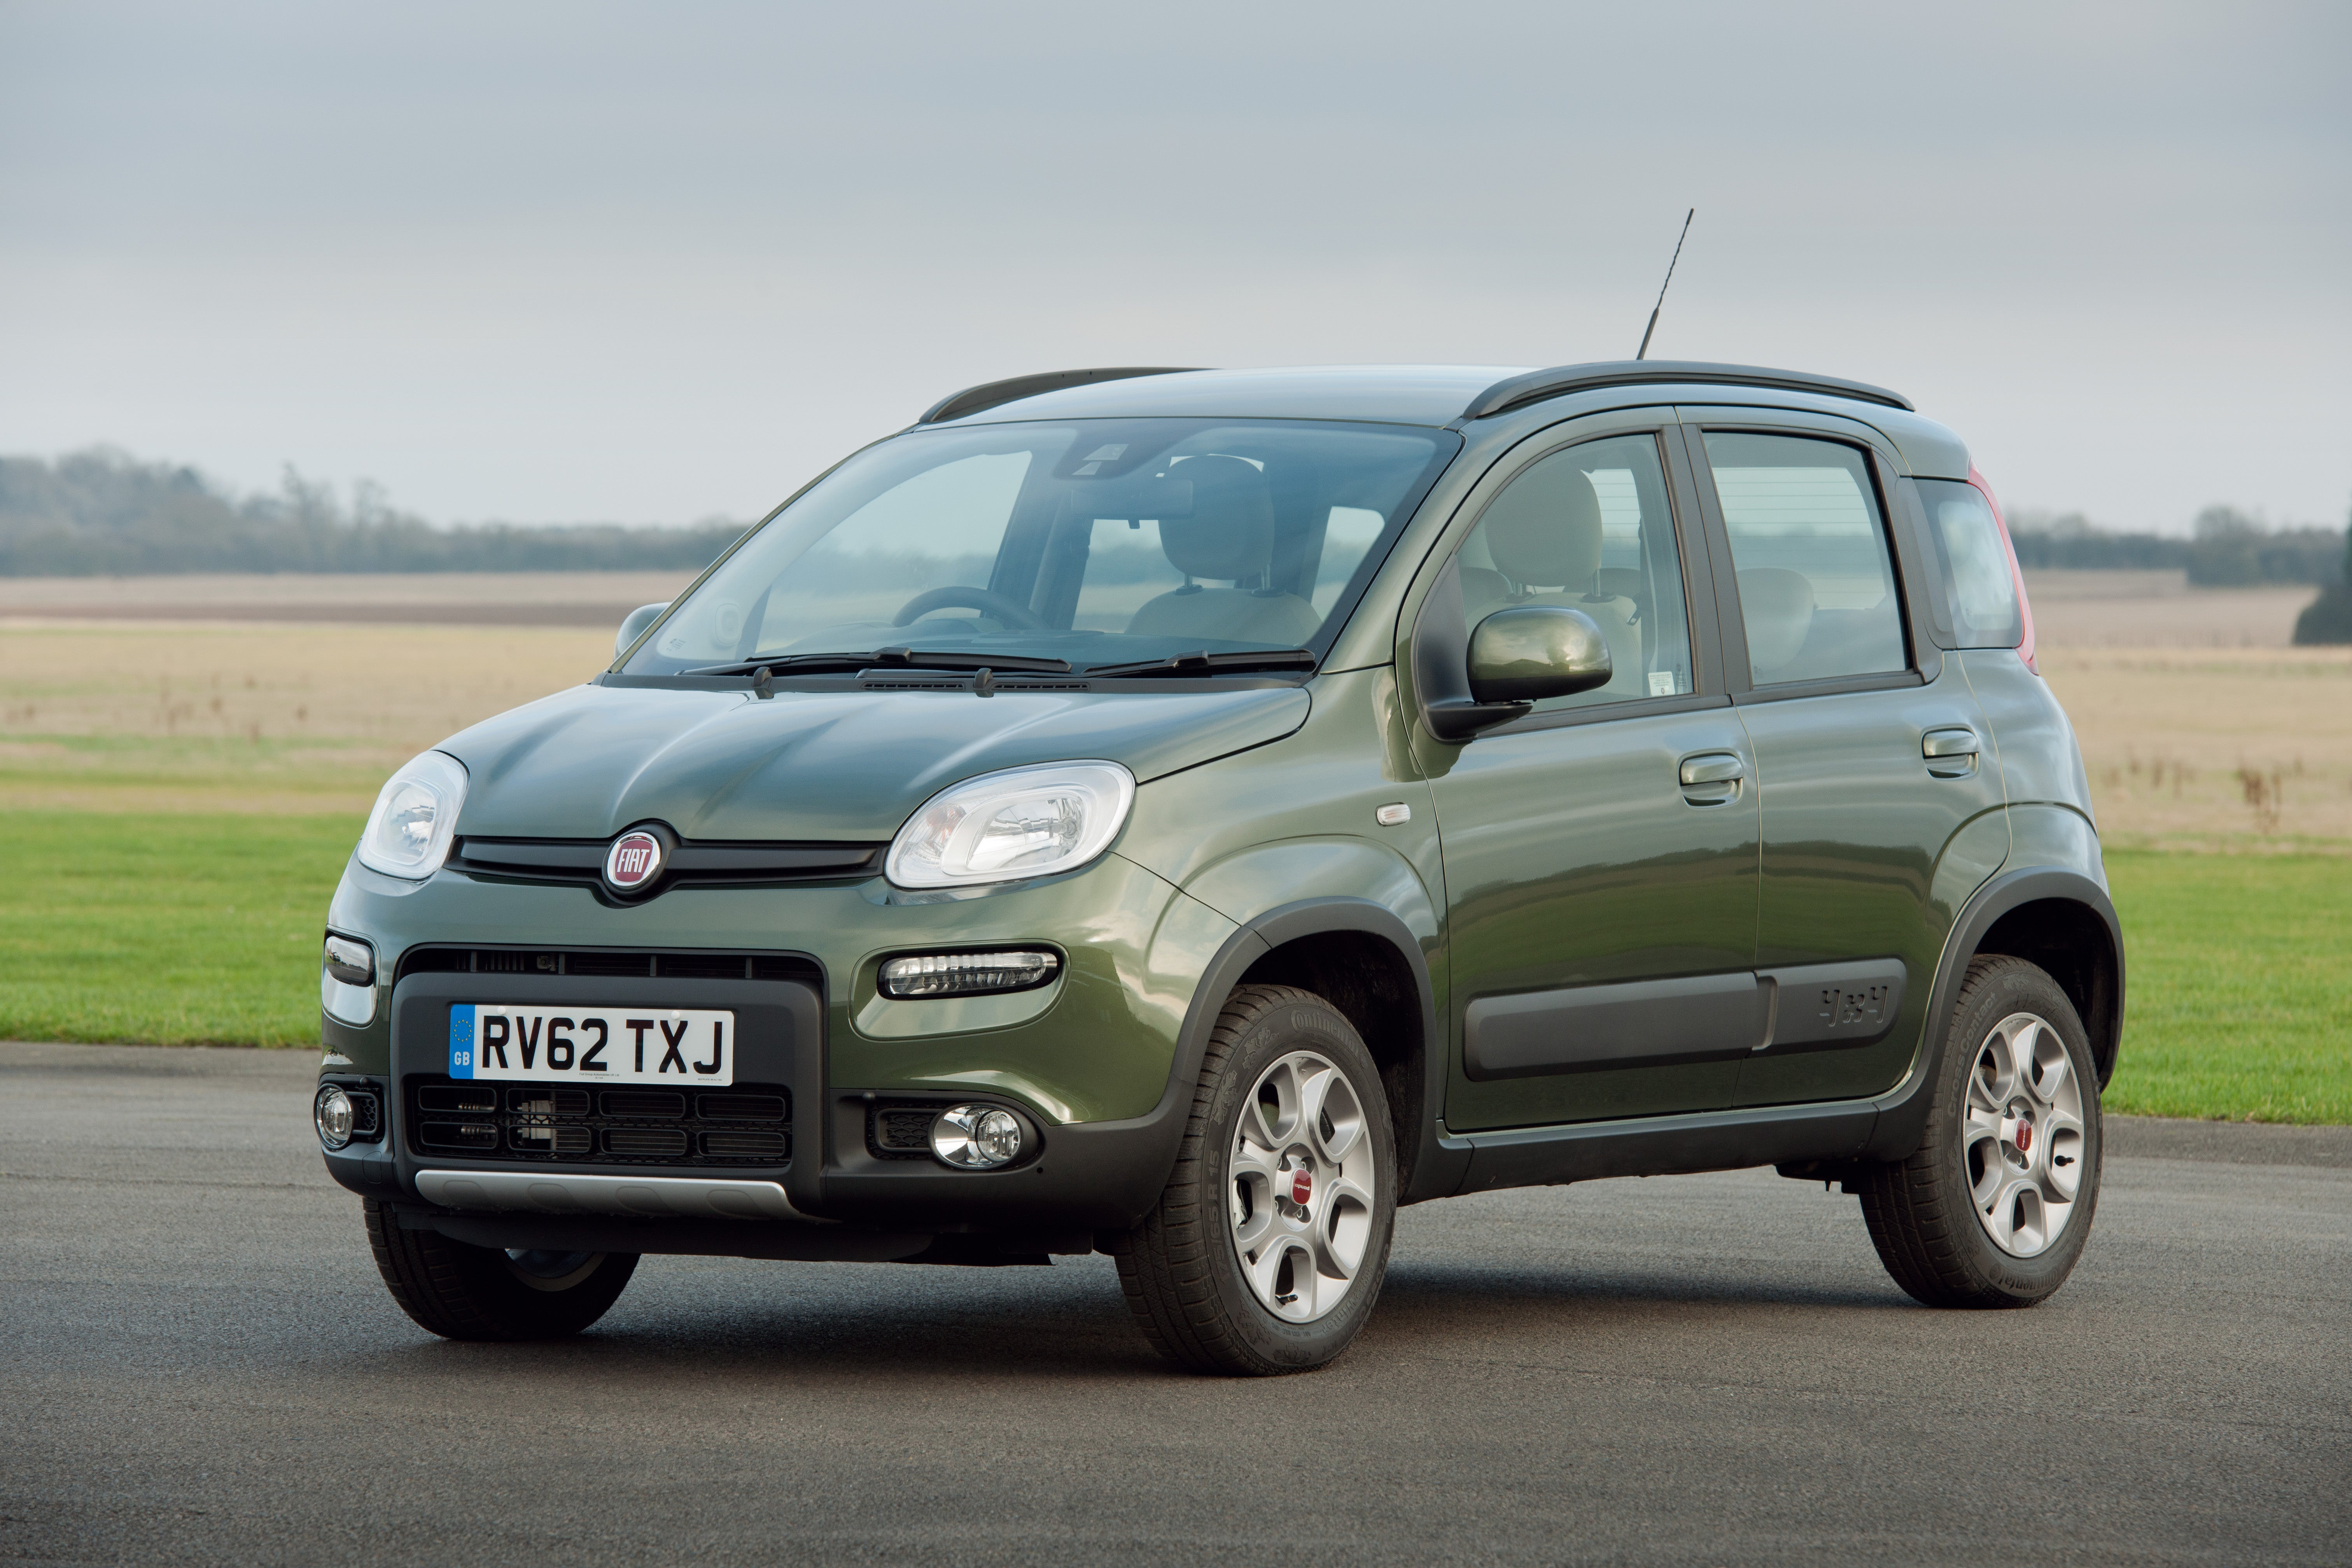 Fiat Panda 4x4 Exterior